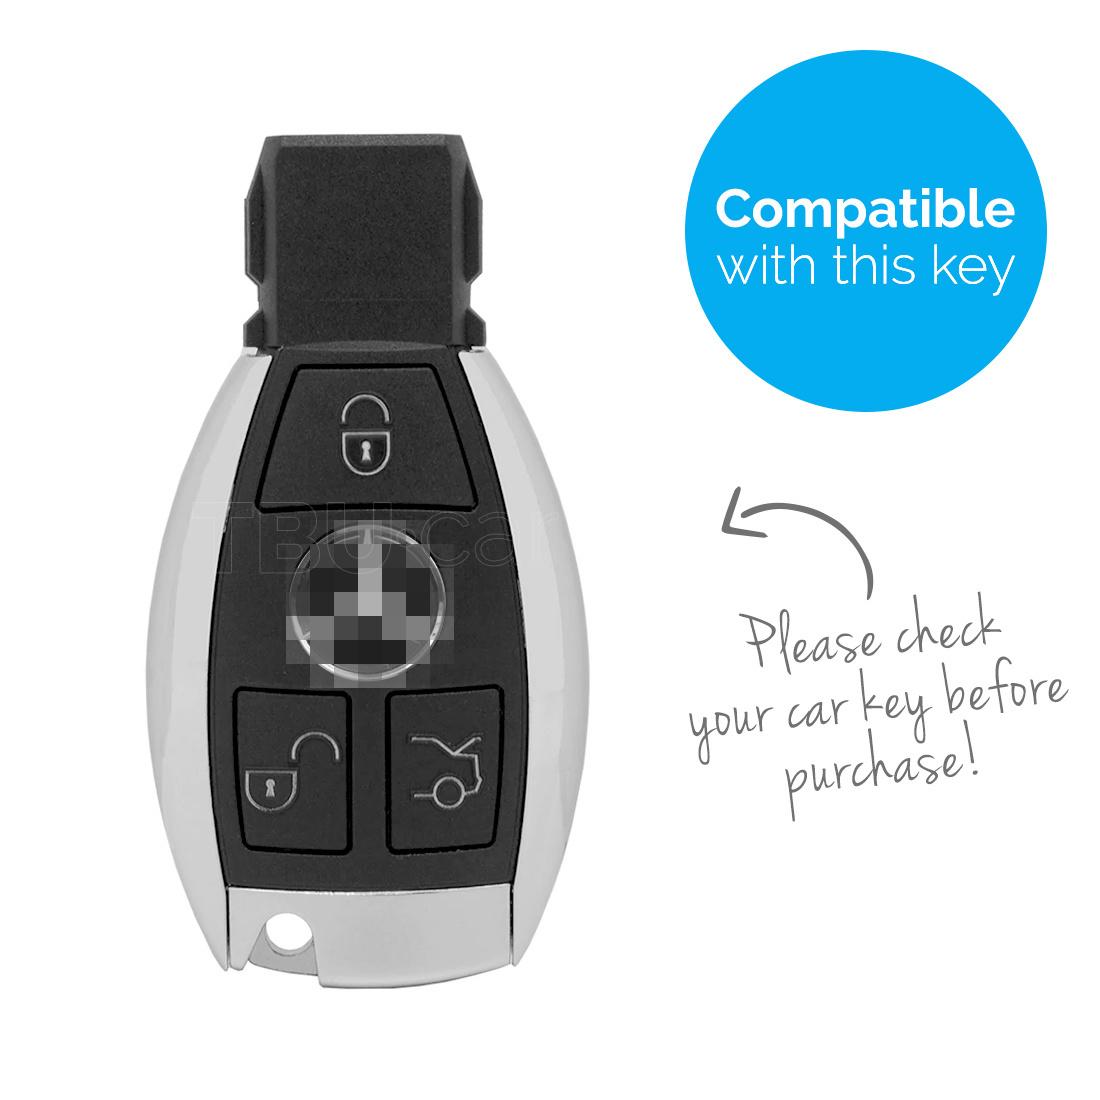 TBU car TBU car Sleutel cover compatibel met Mercedes - TPU sleutel hoesje / beschermhoesje autosleutel - Roségoud